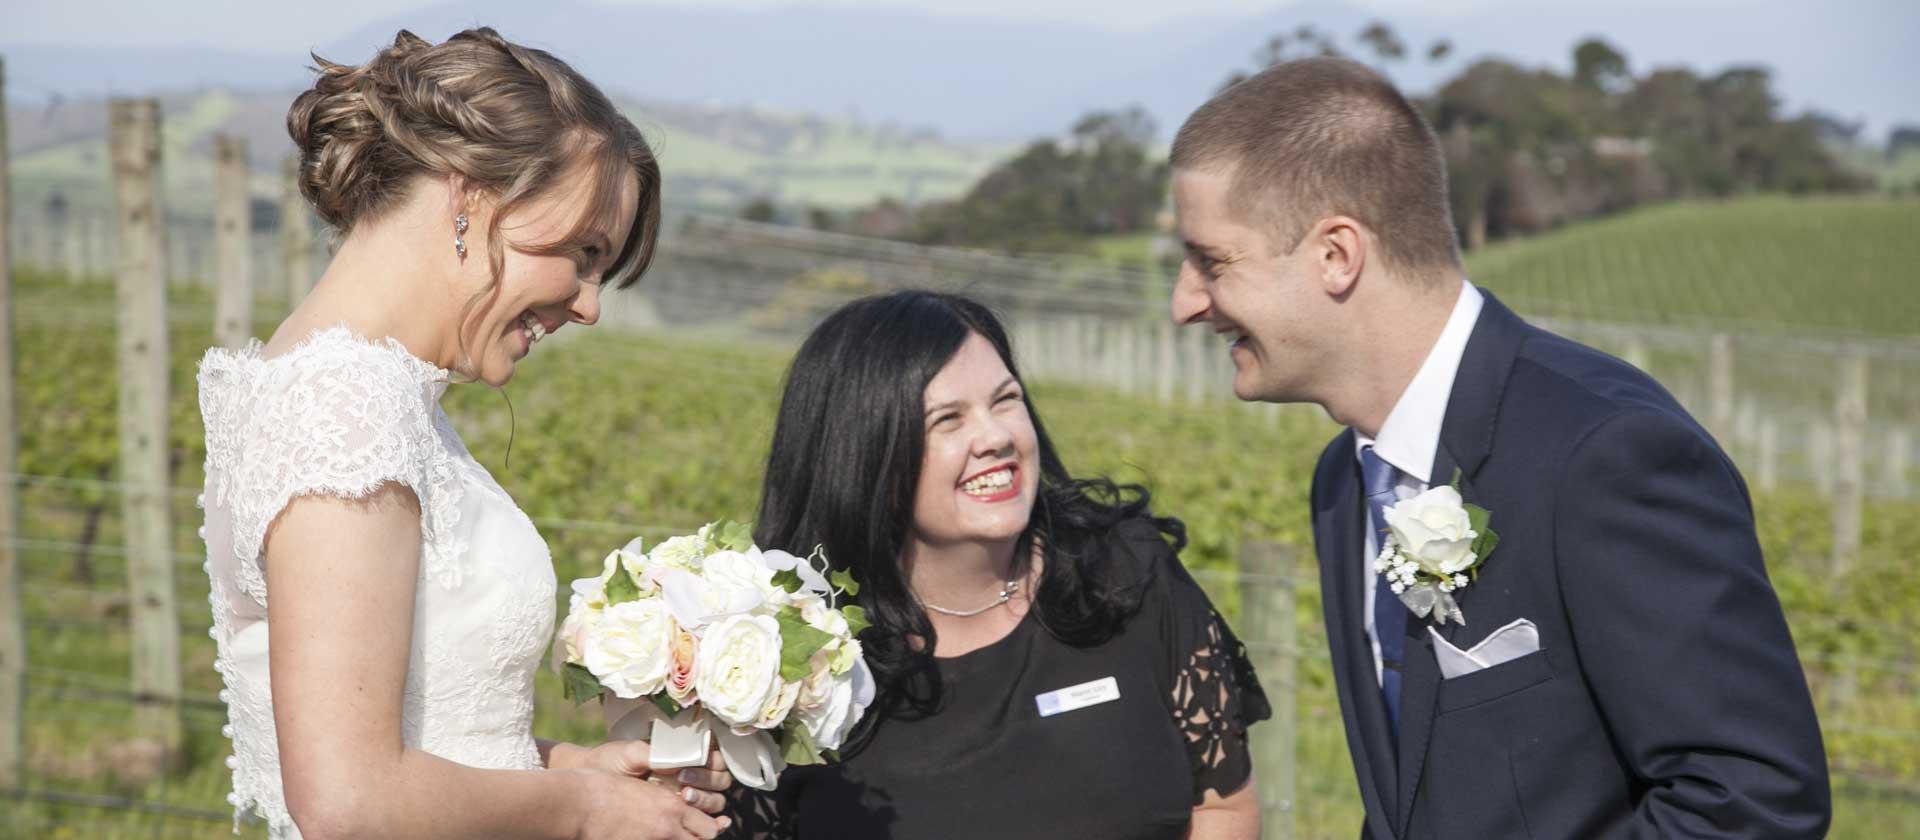 Wedding Ceremony Planning